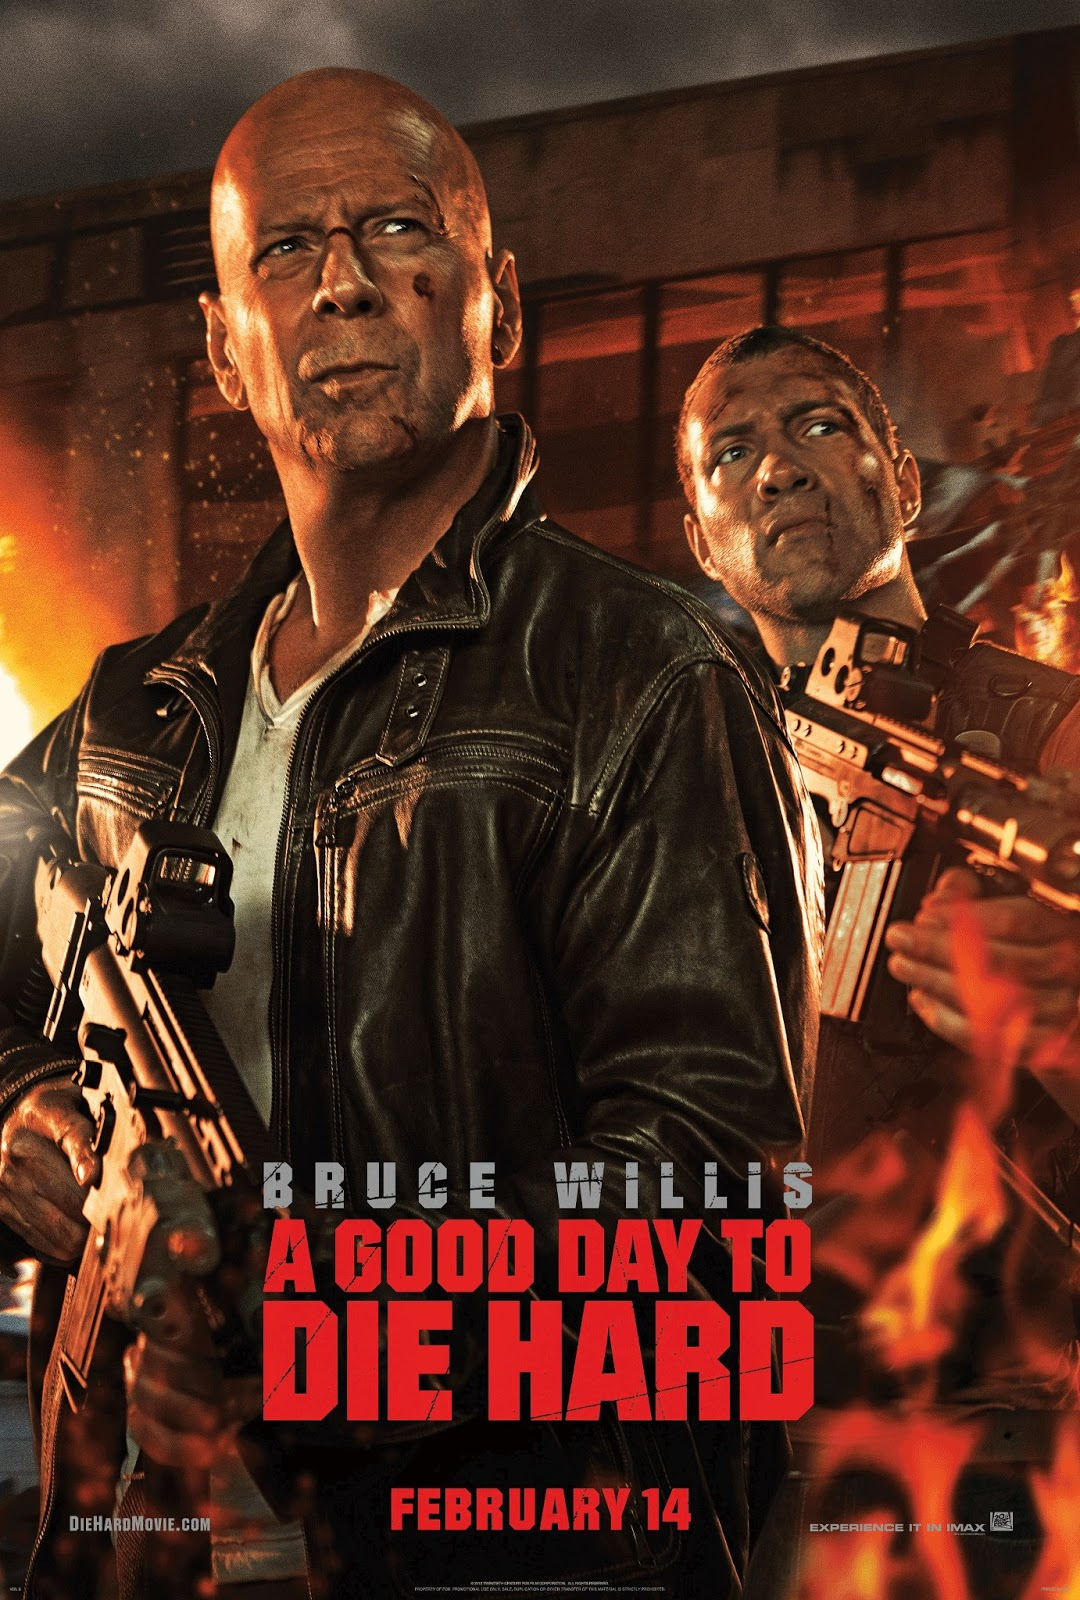 Watch full movie a good day to die hard online